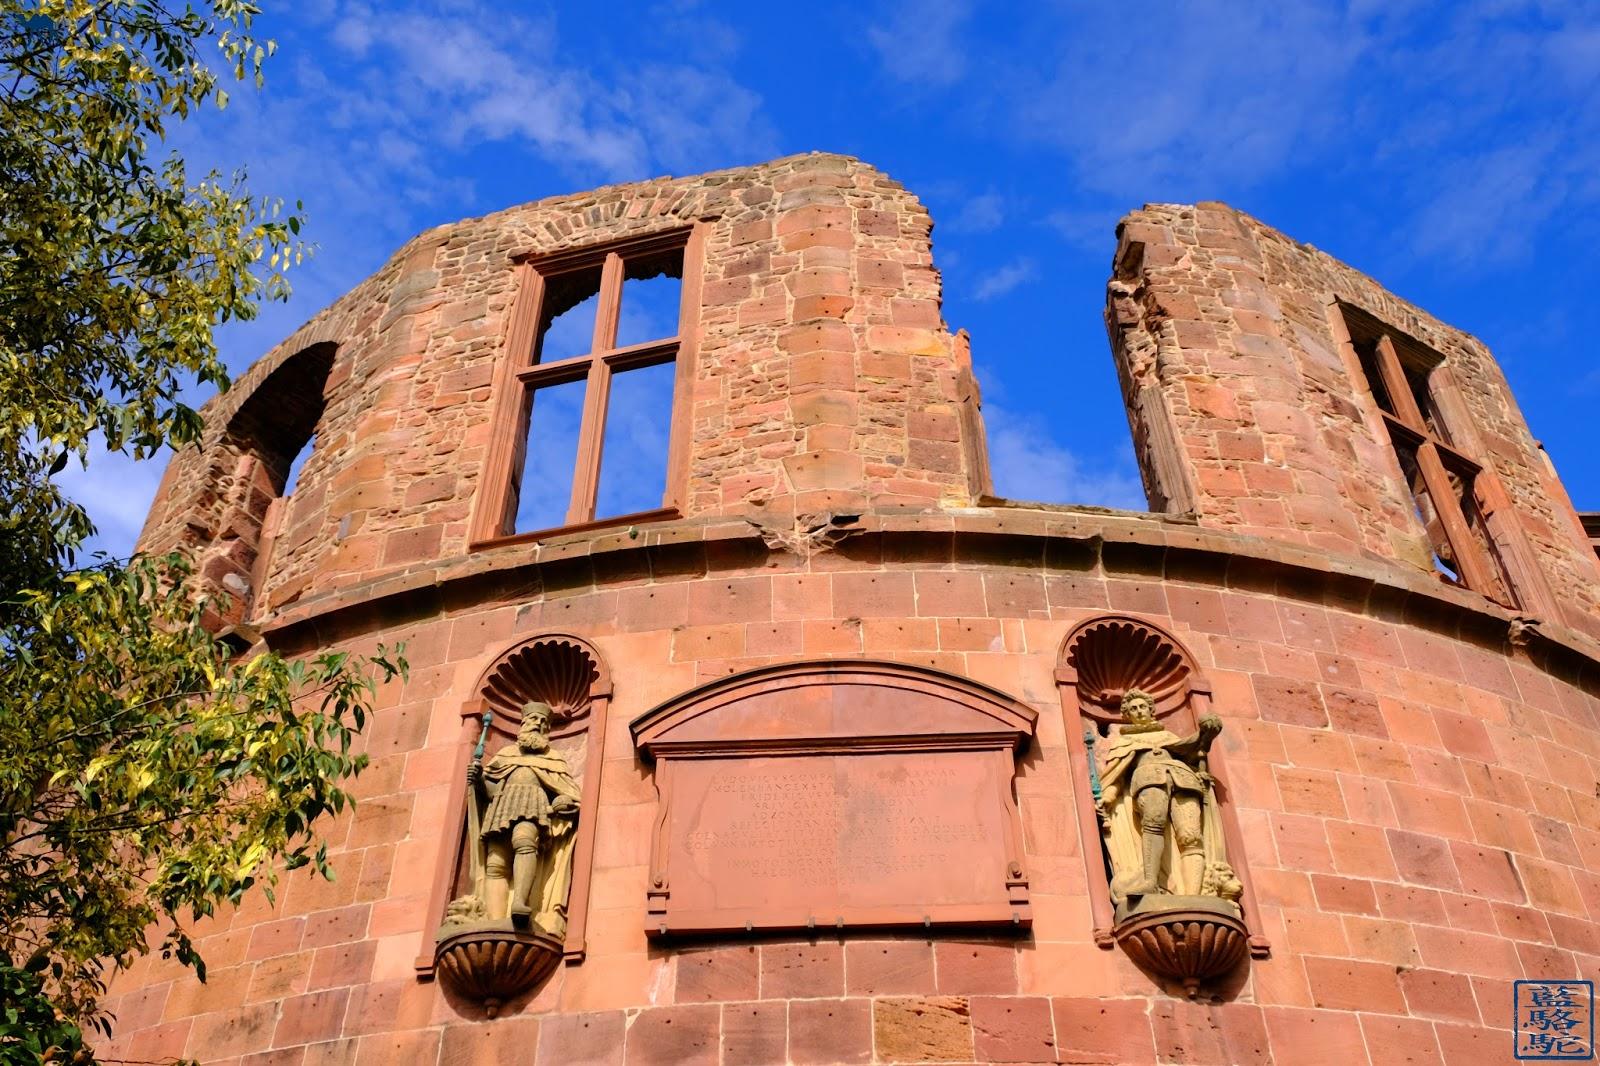 Le Chameau Bleu - Chateau Heidelberg - statue